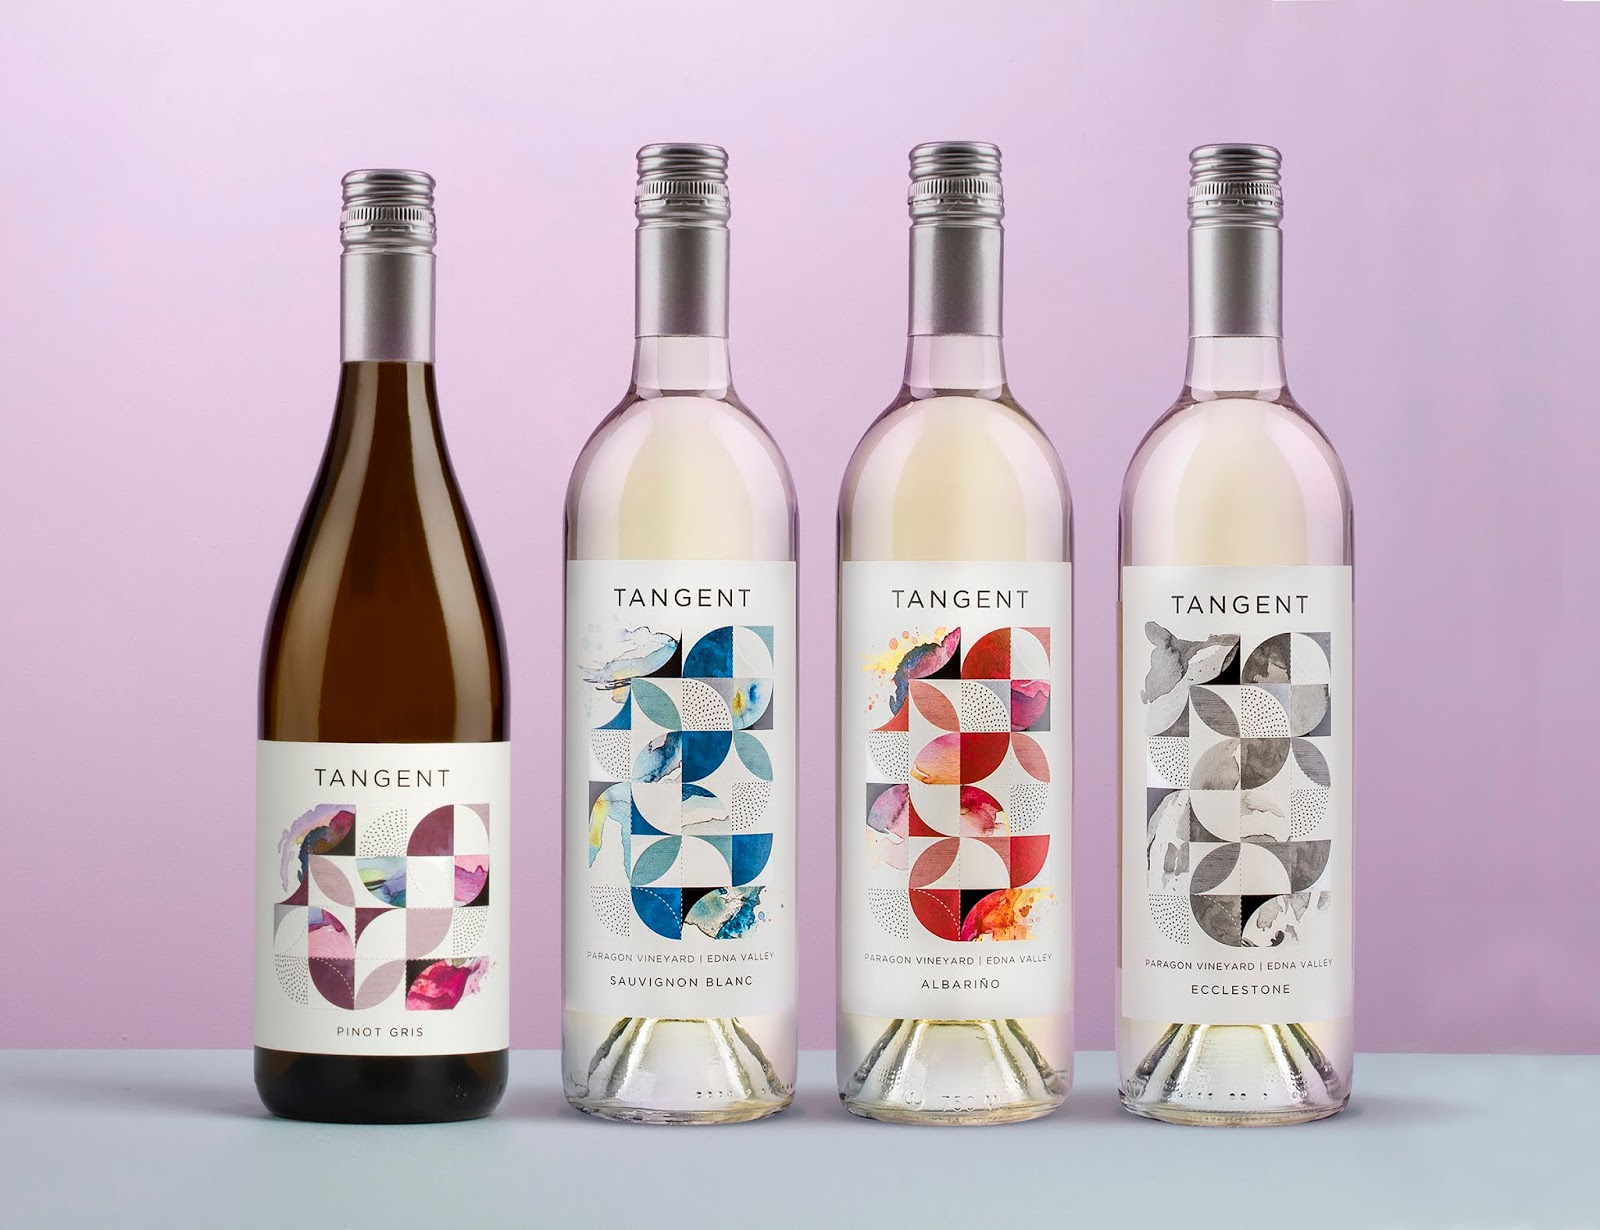 Tangent葡萄酒包装设计